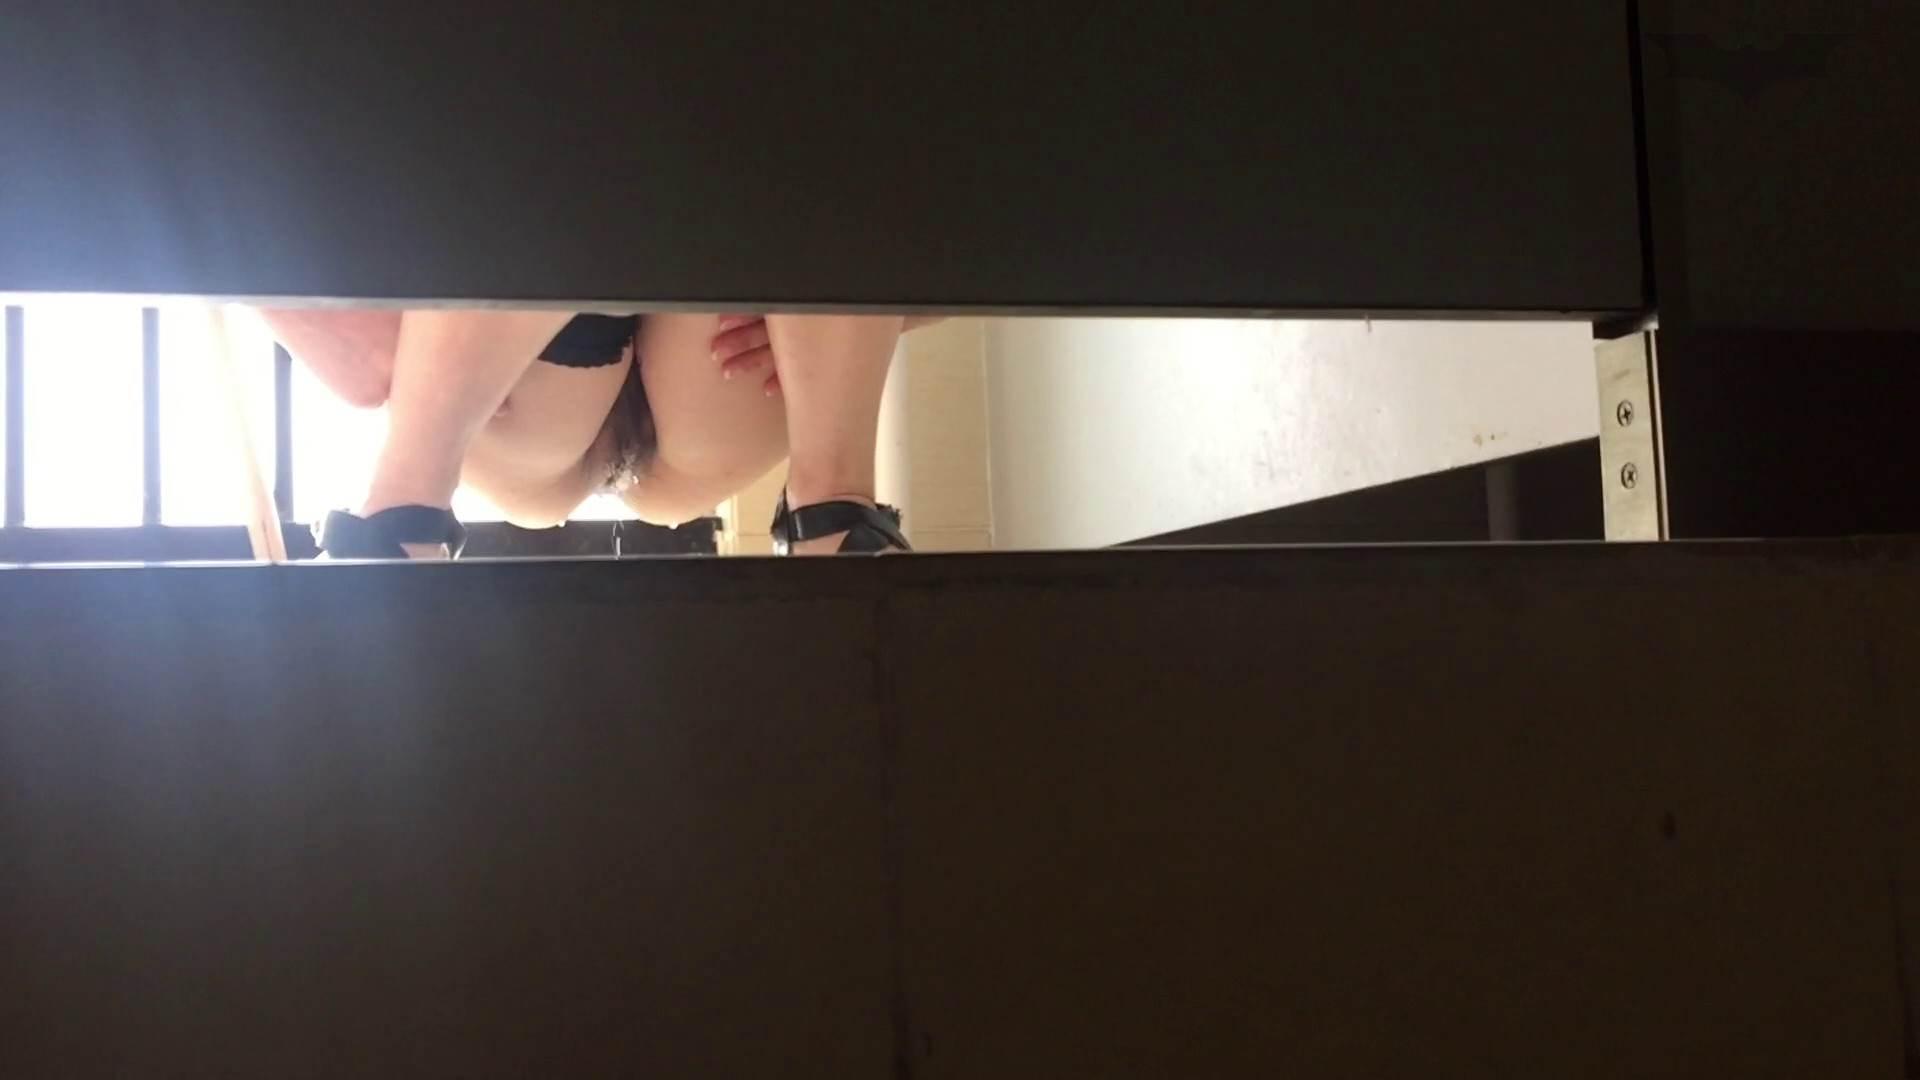 JD盗撮 美女の洗面所の秘密 Vol.73 盛合せ SEX無修正画像 67画像 33